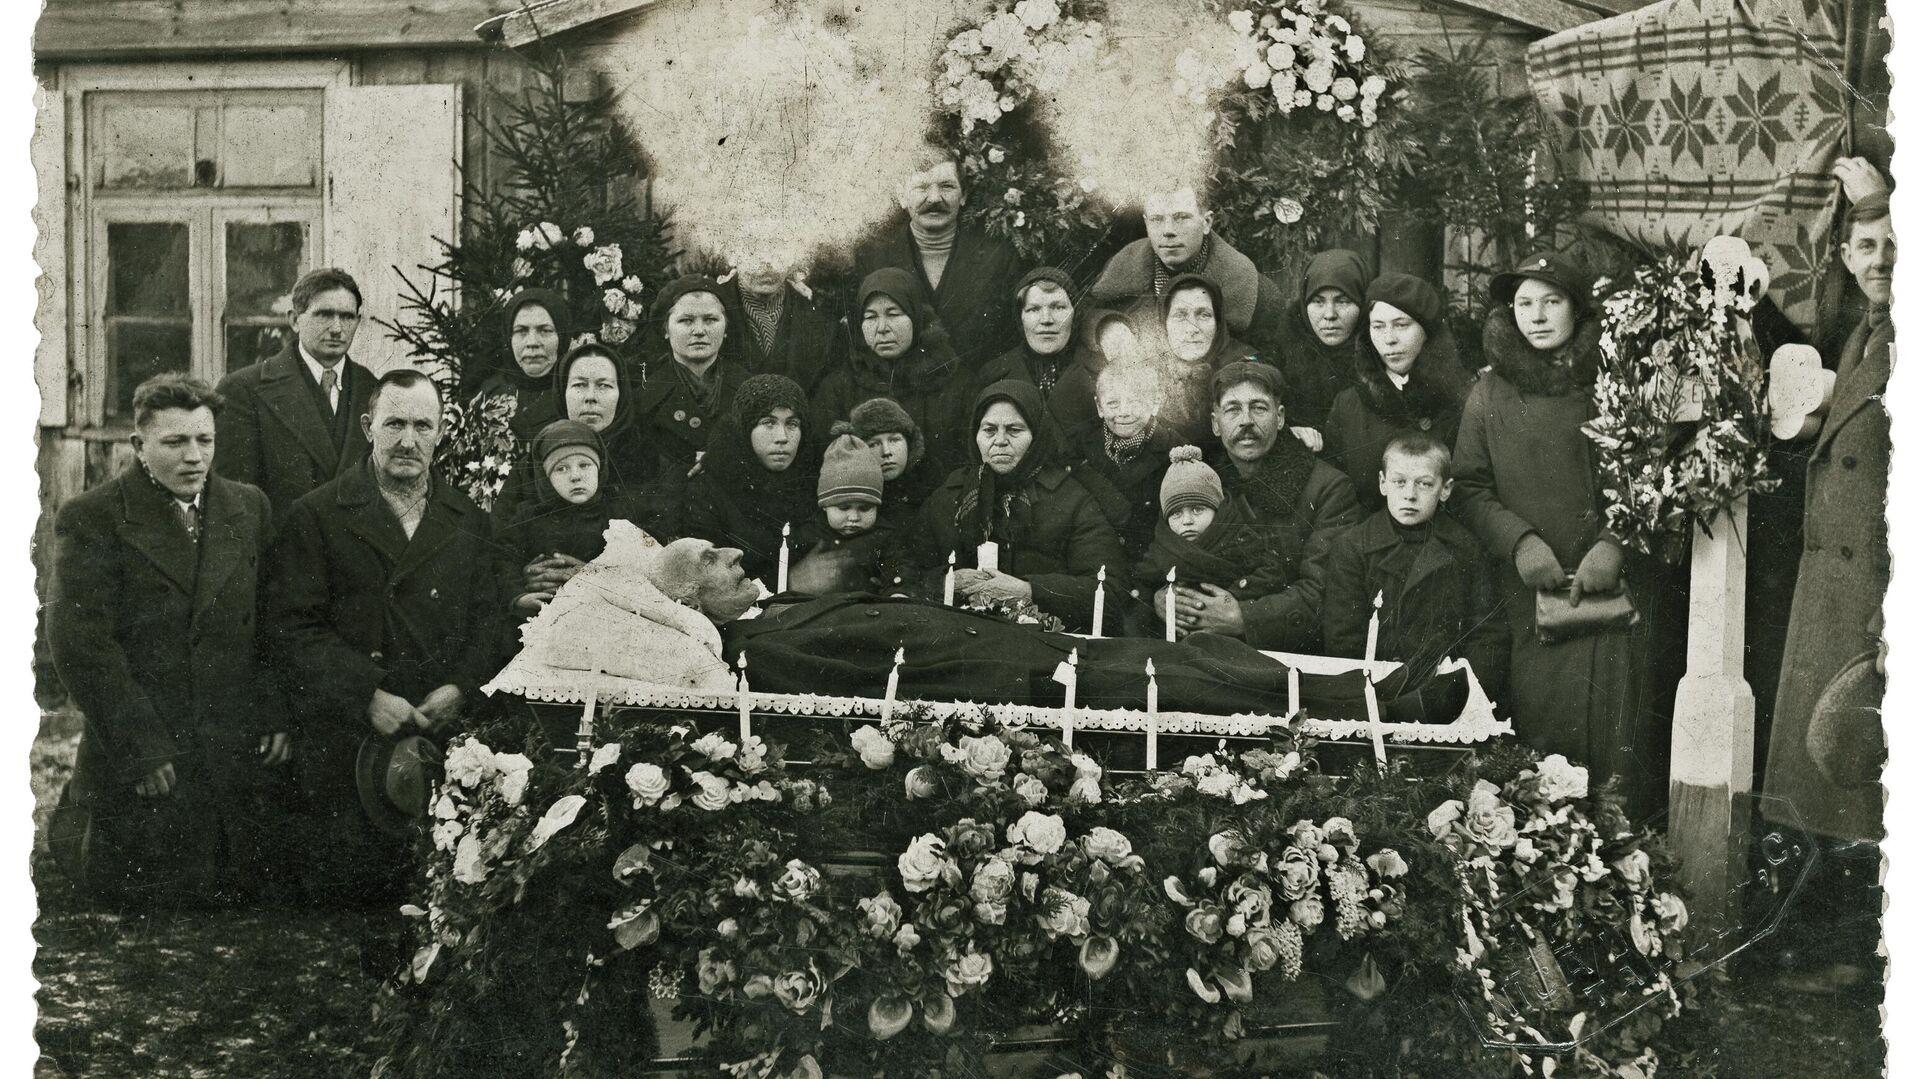 Difunto con miembros de su familia - Sputnik Mundo, 1920, 05.06.2021